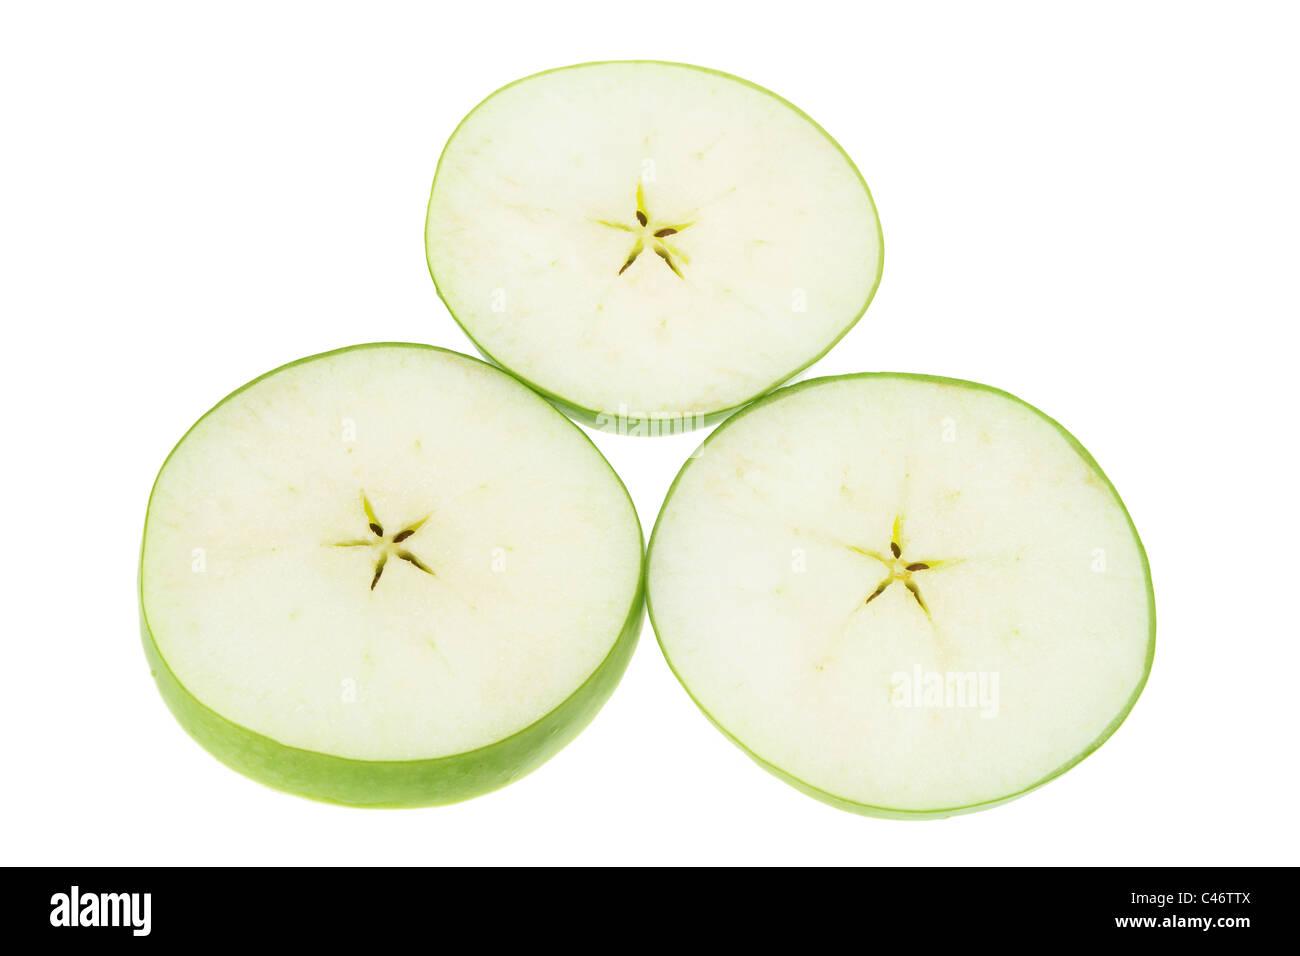 Slices of Granny Smith Apple - Stock Image